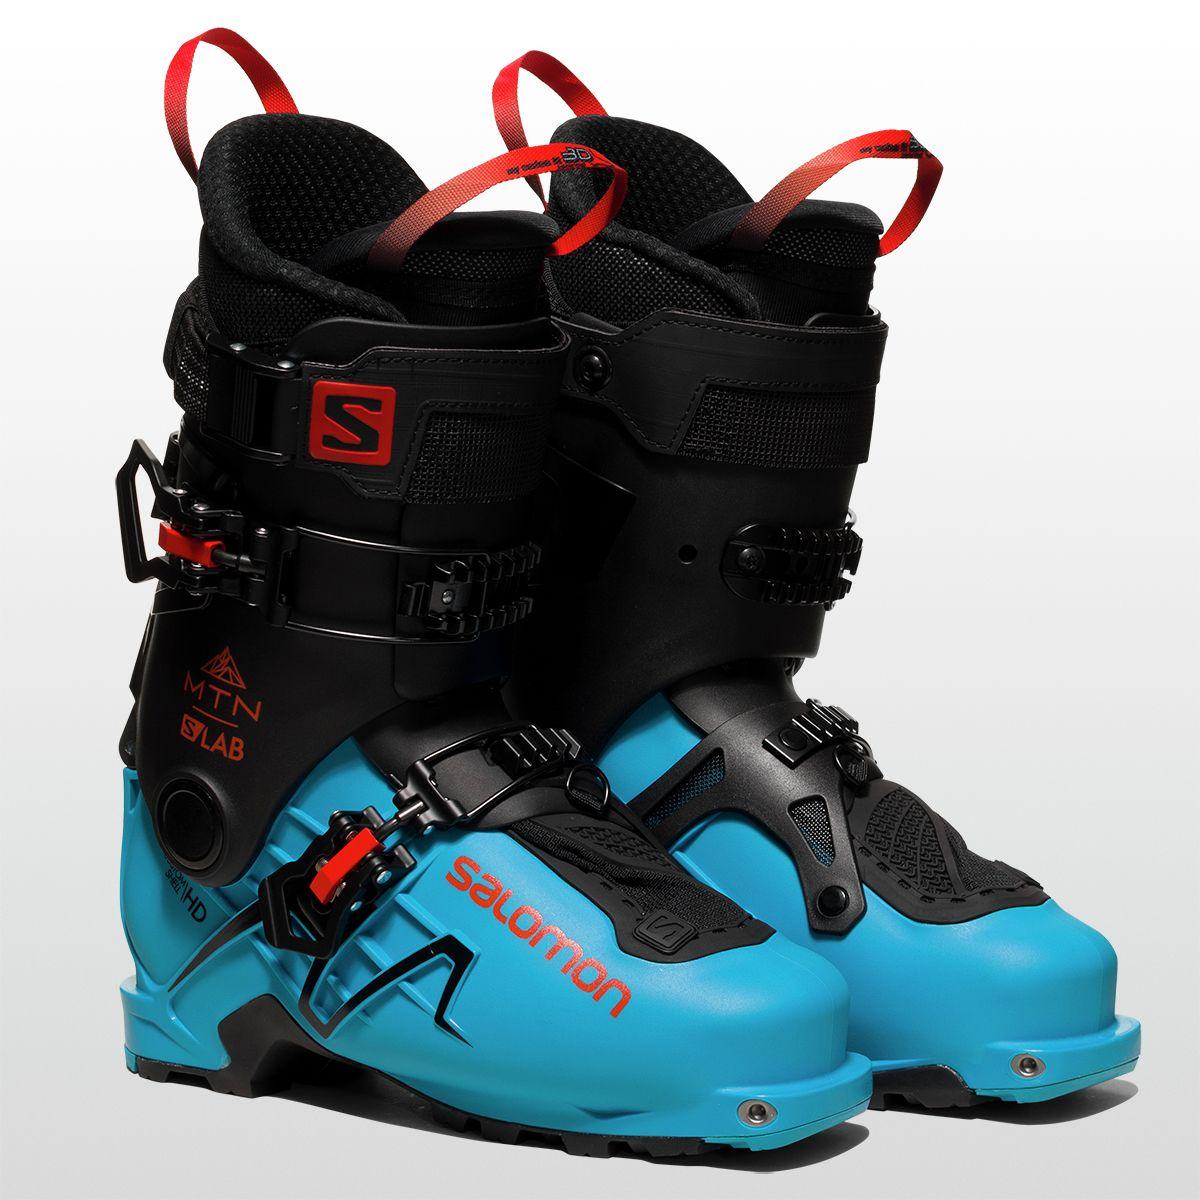 Test touring ski boots Salomon MTN Explore | Shop